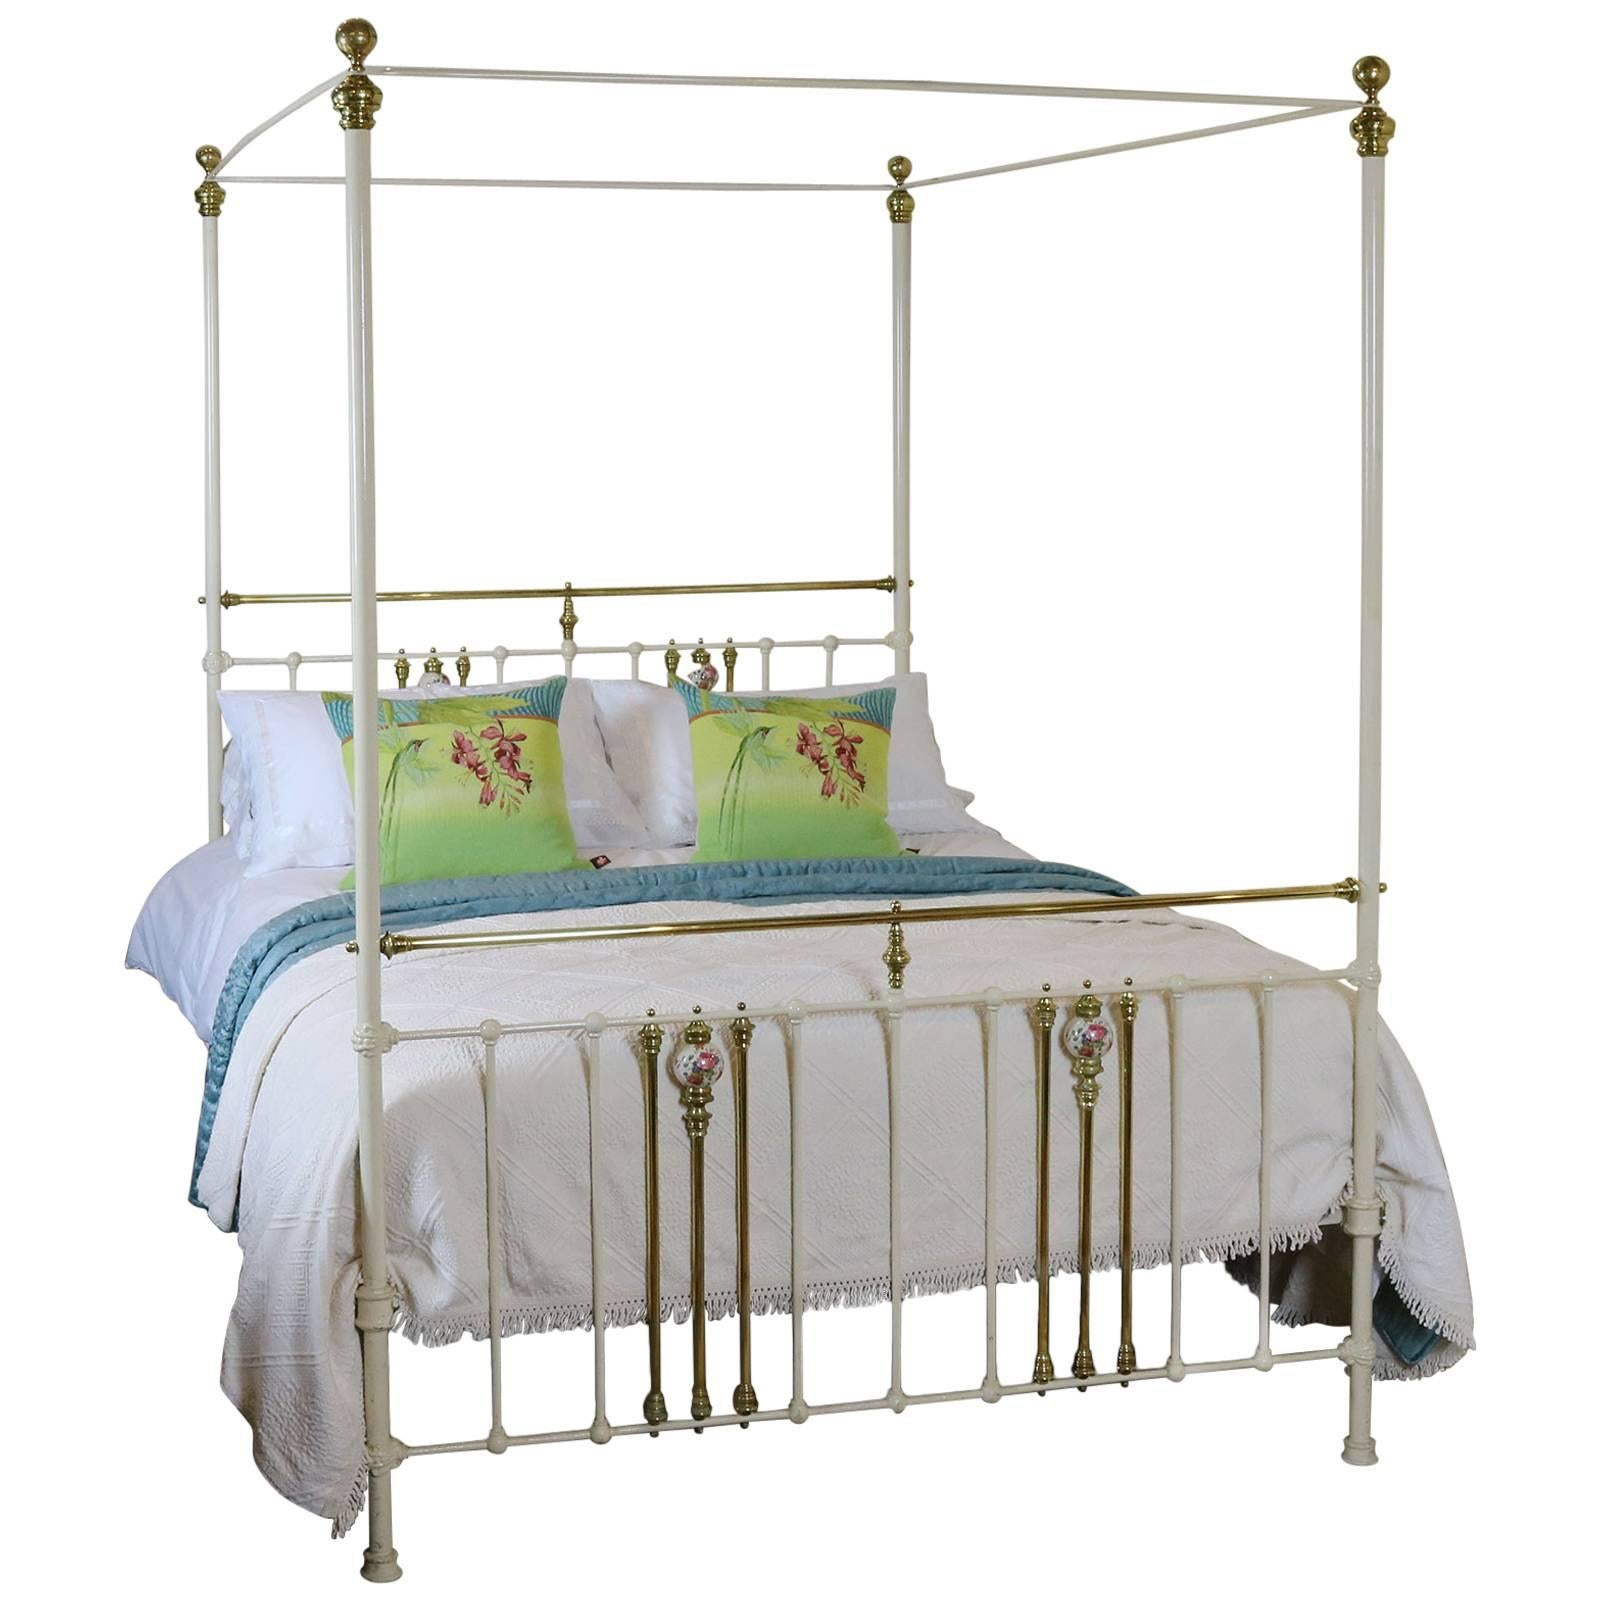 13c44b2f0508 Cream Metal Four Poster Bed